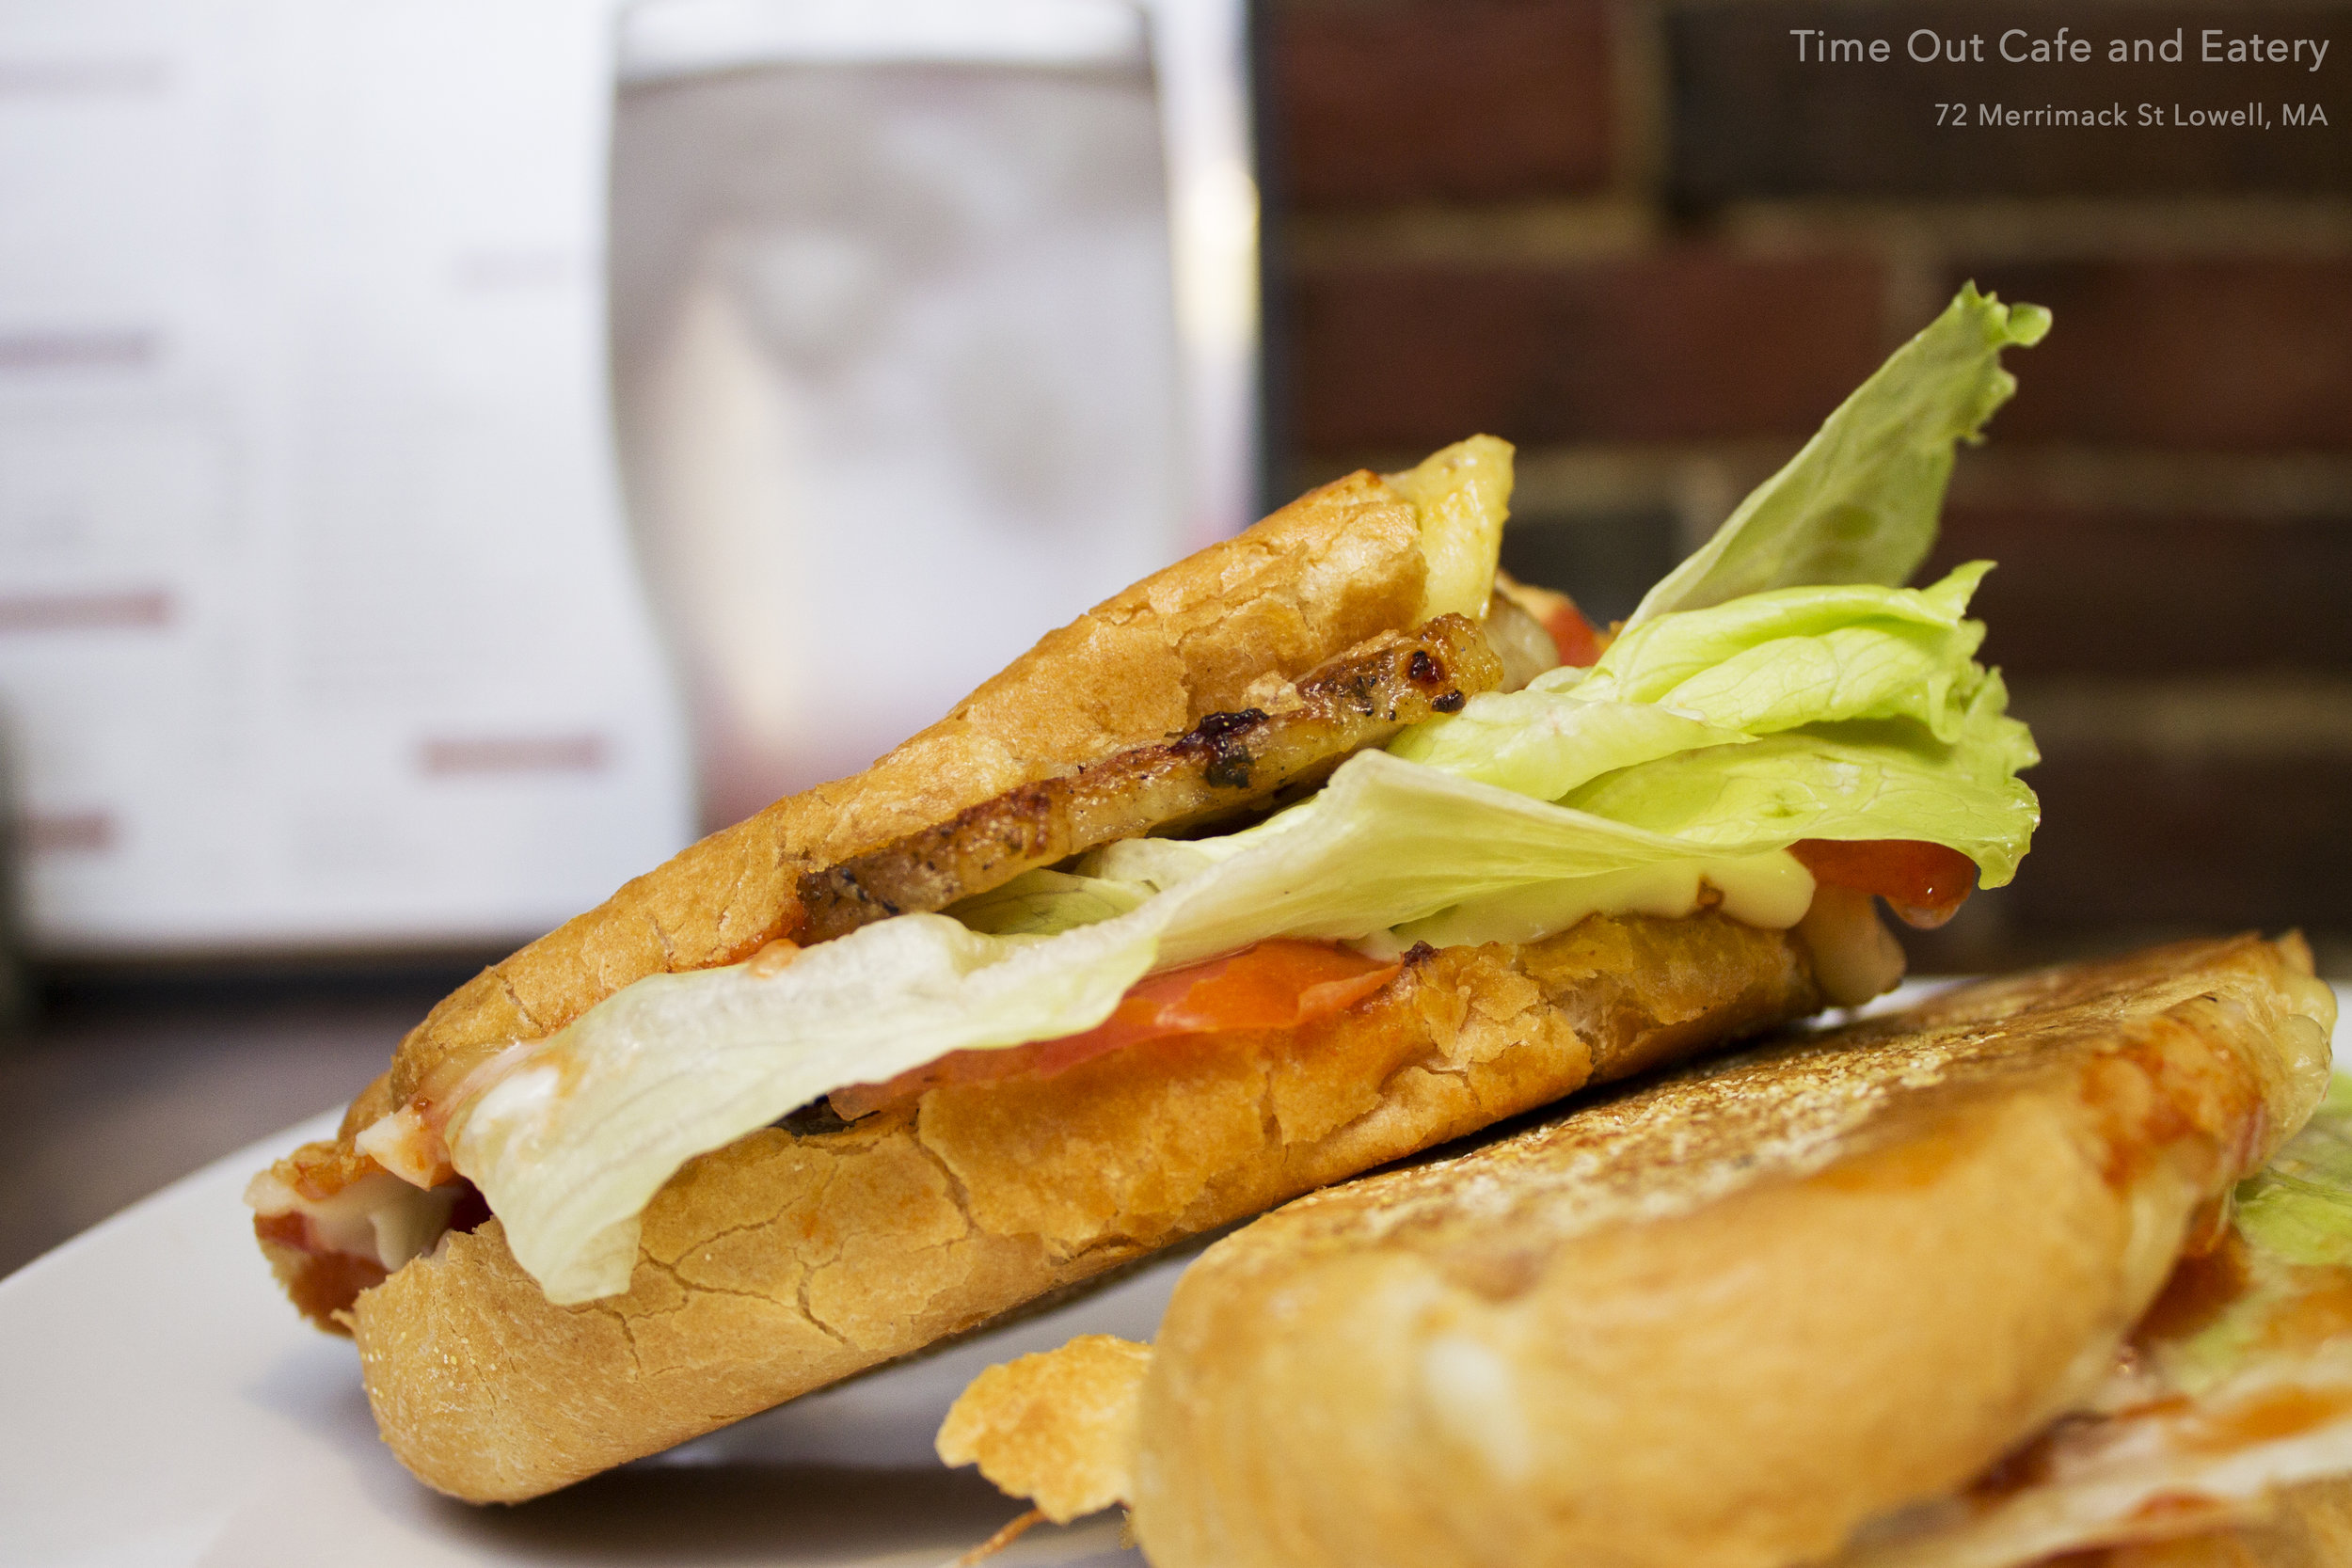 Cuban_Sandwich_Lowell_ma_Timeoutcafe_72_merrimack_st.jpg